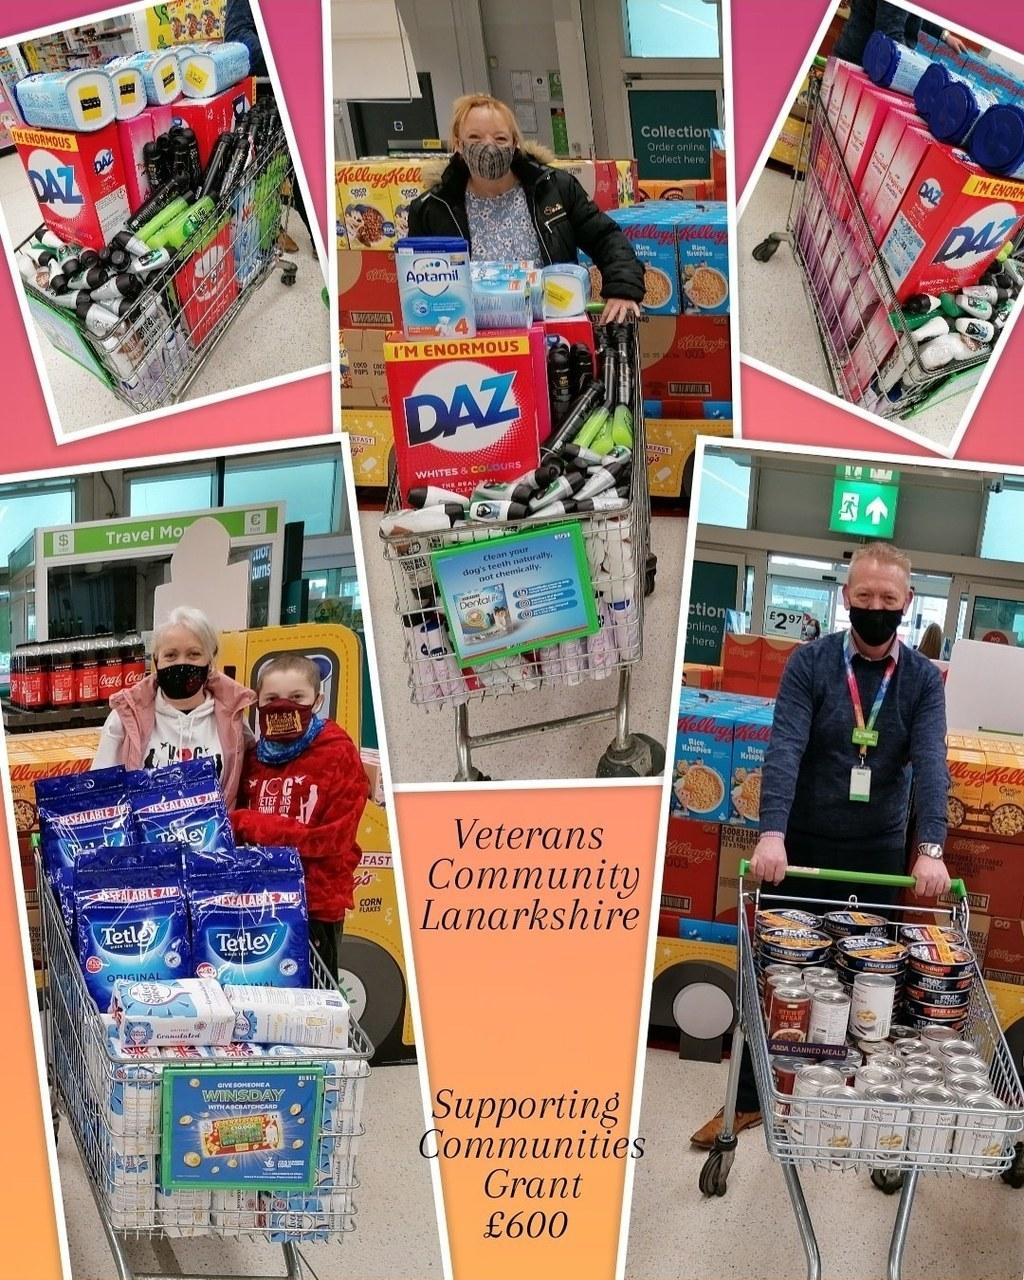 Grant for veterans charity | Asda Motherwell